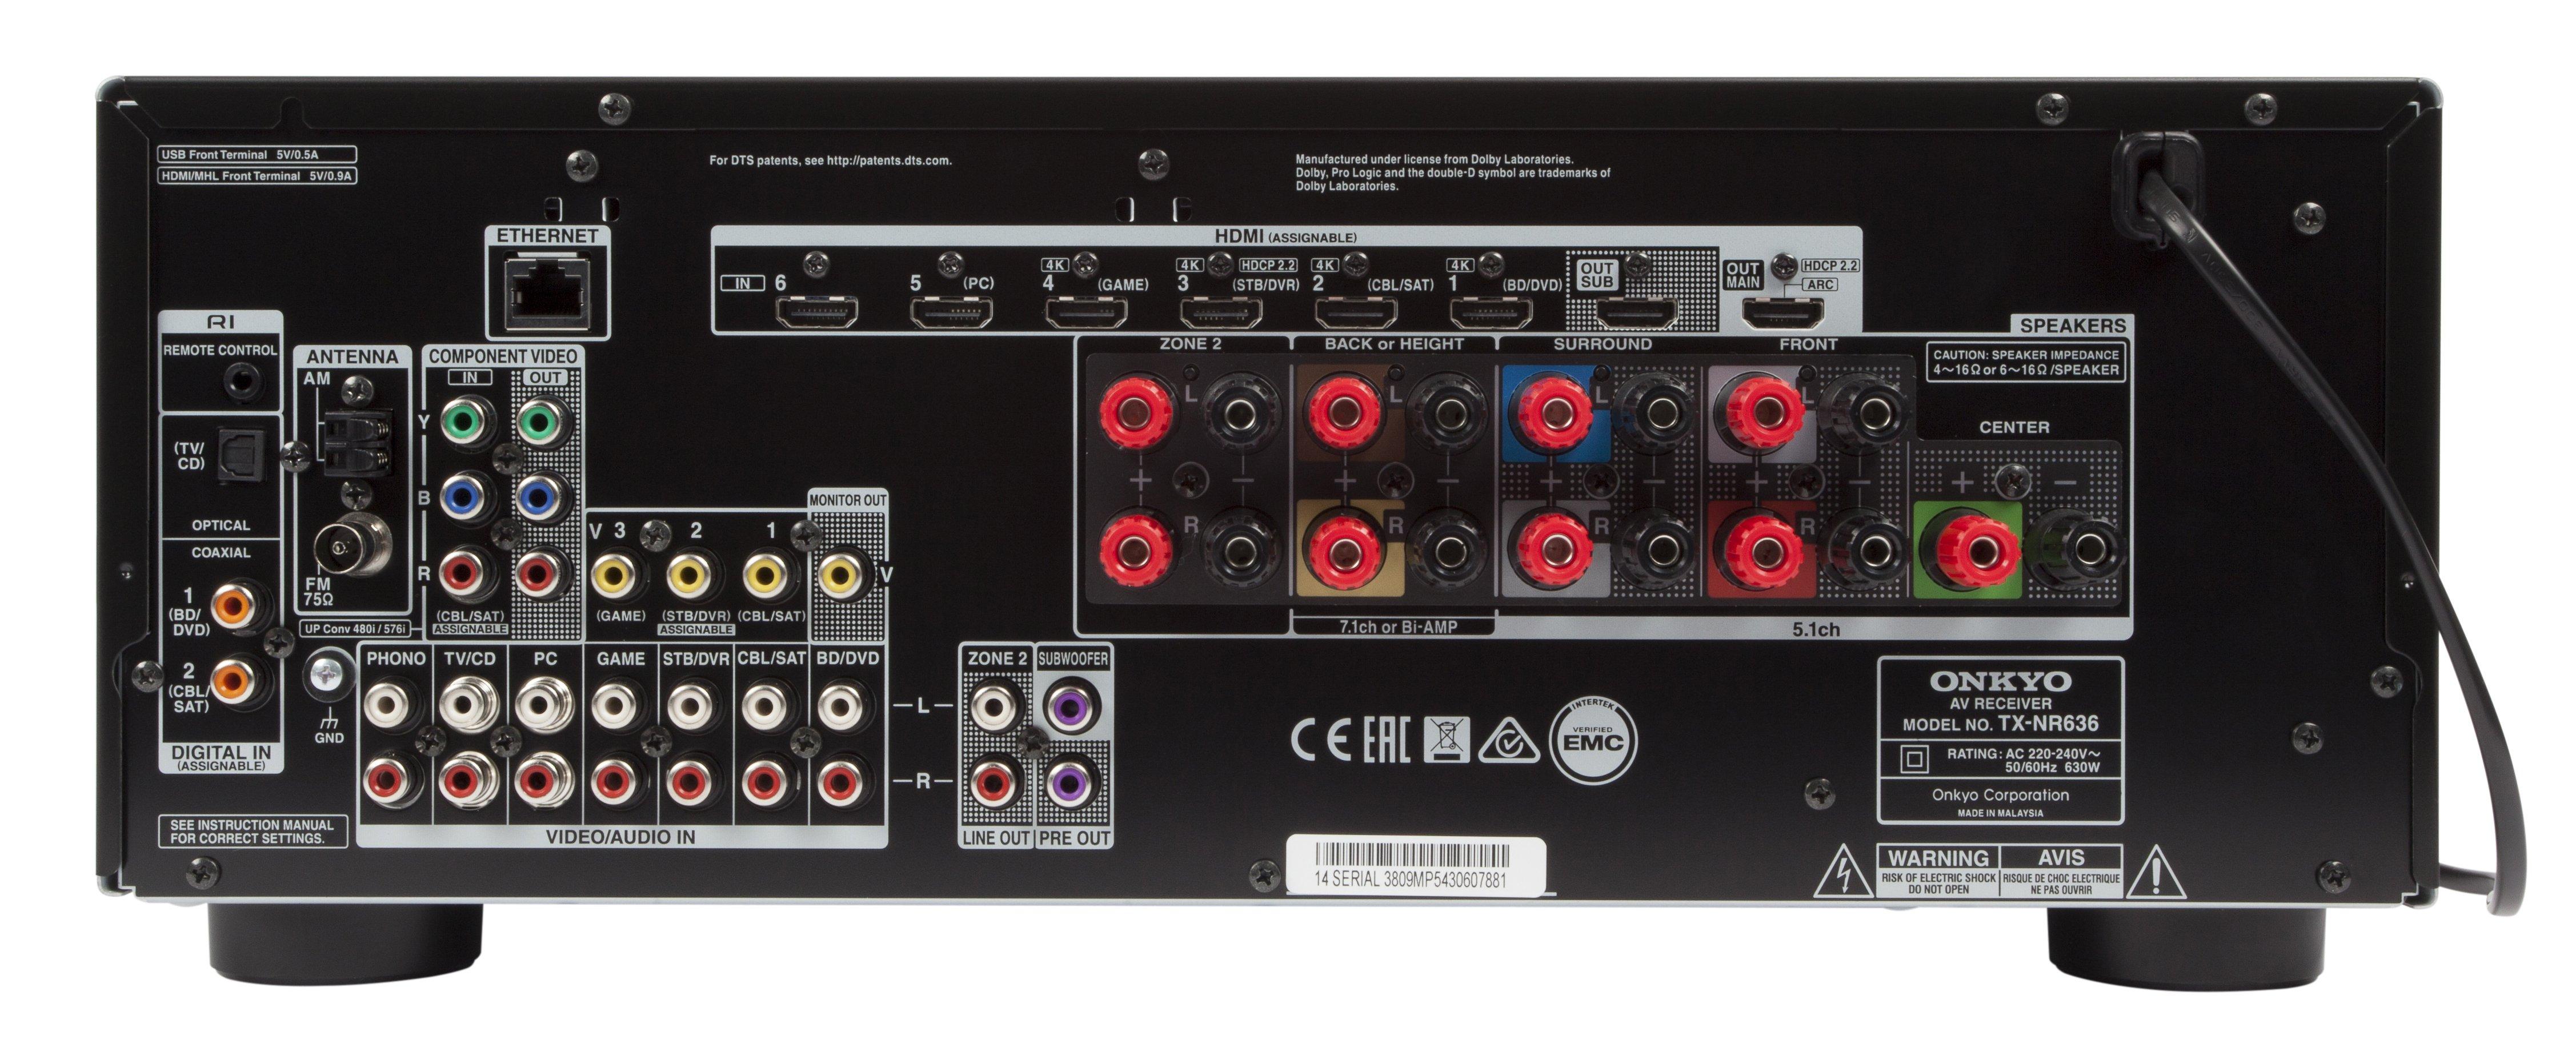 Onkyo TX-NR636 review | Expert Reviews